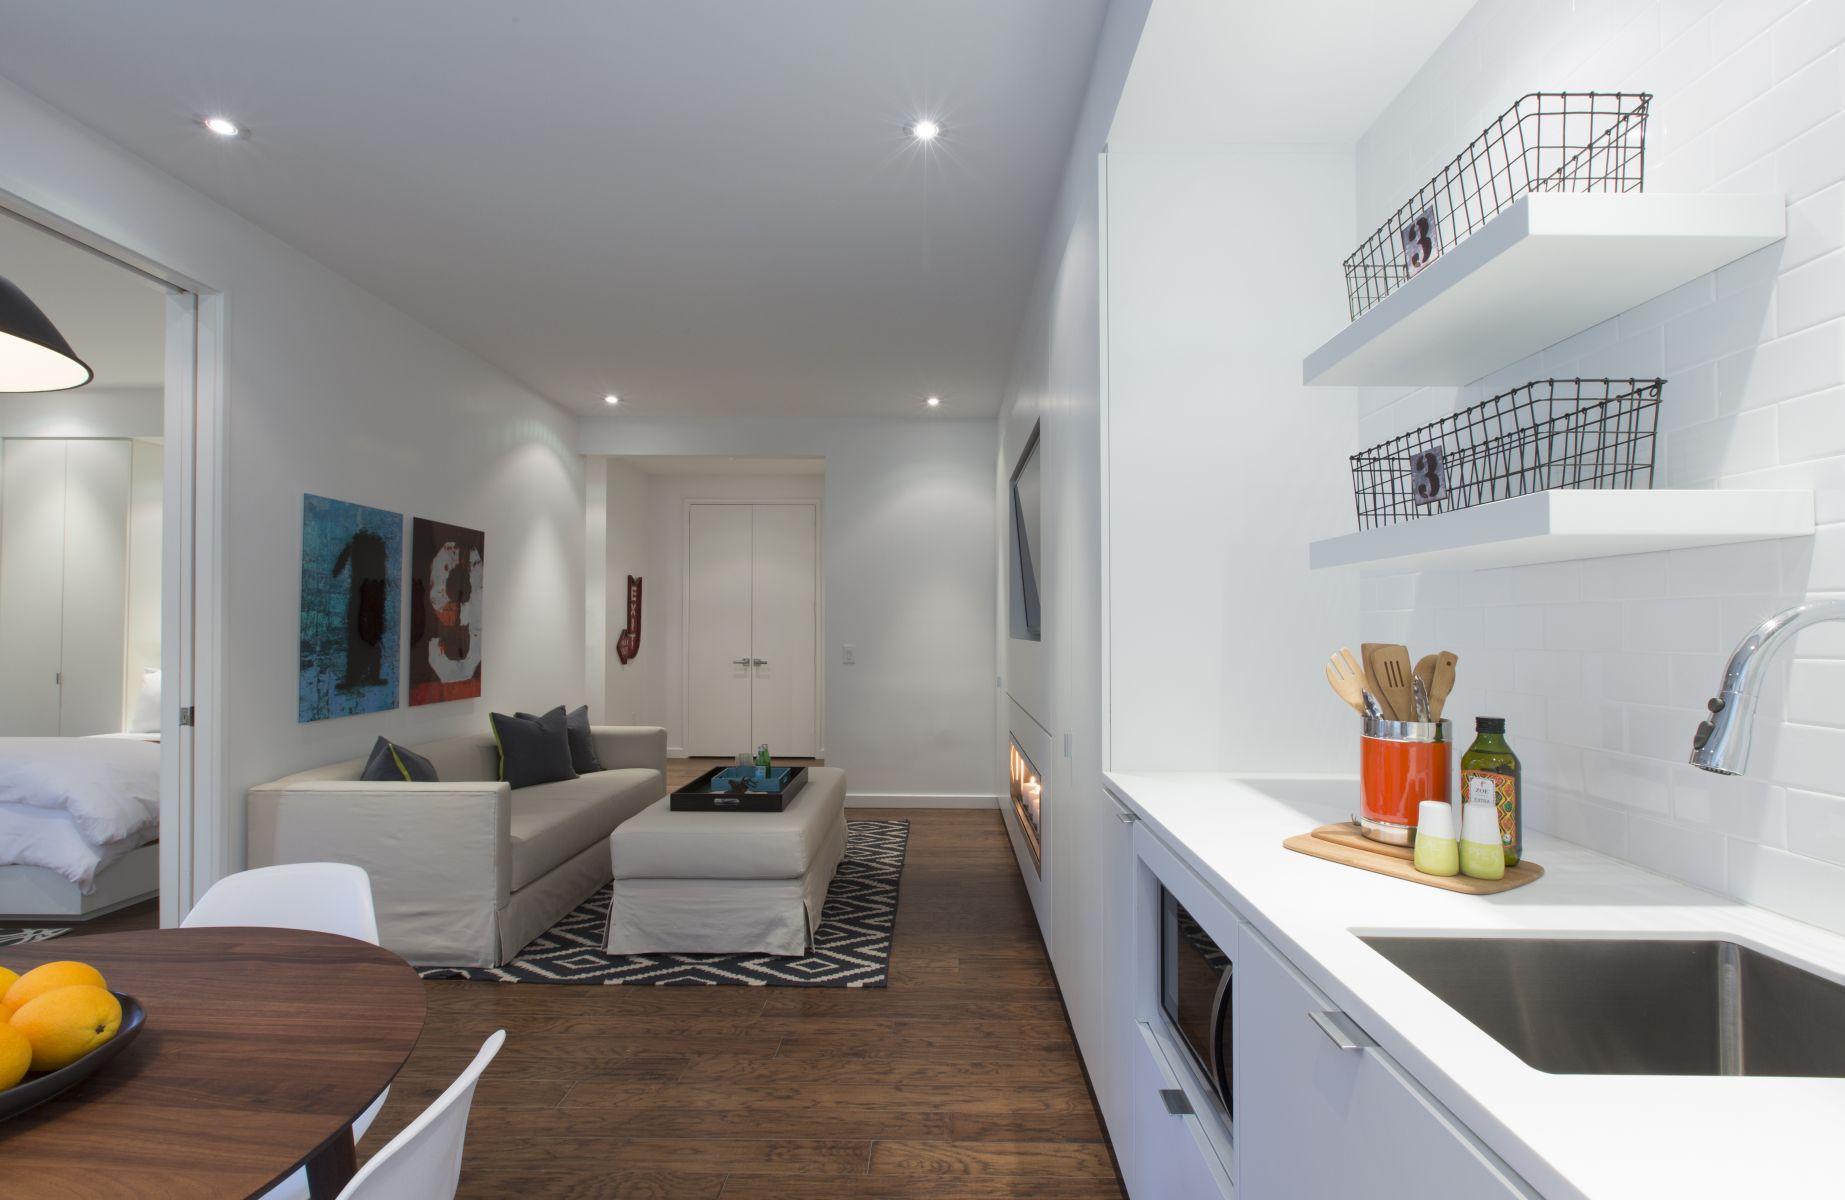 Cecconi simone project oglethorpe - Modern infill house cecconi simone ...